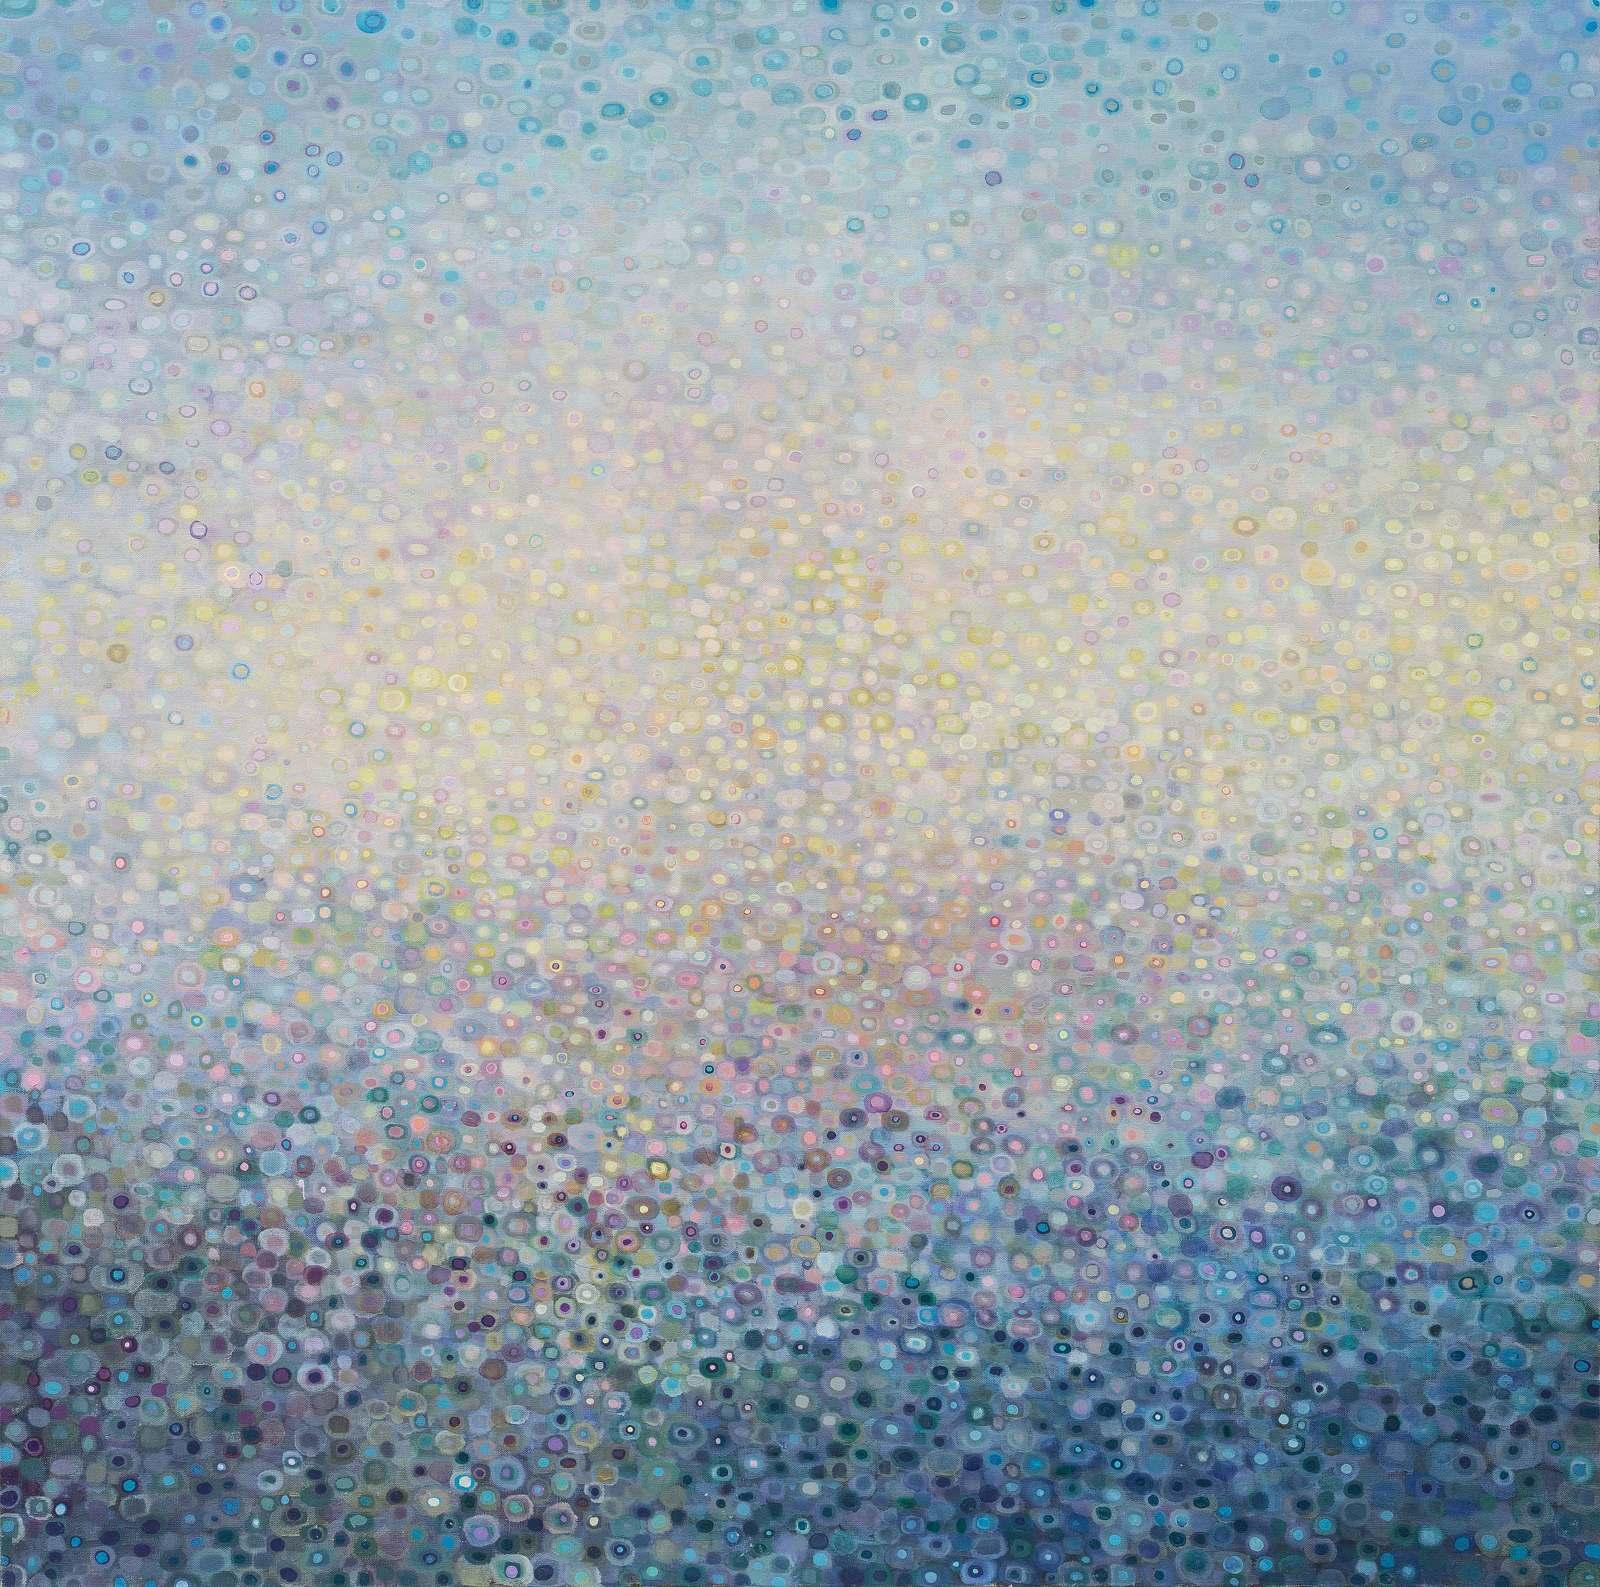 "Luminescence No.11, 40"" x 40"", oil on canvas, 2017"